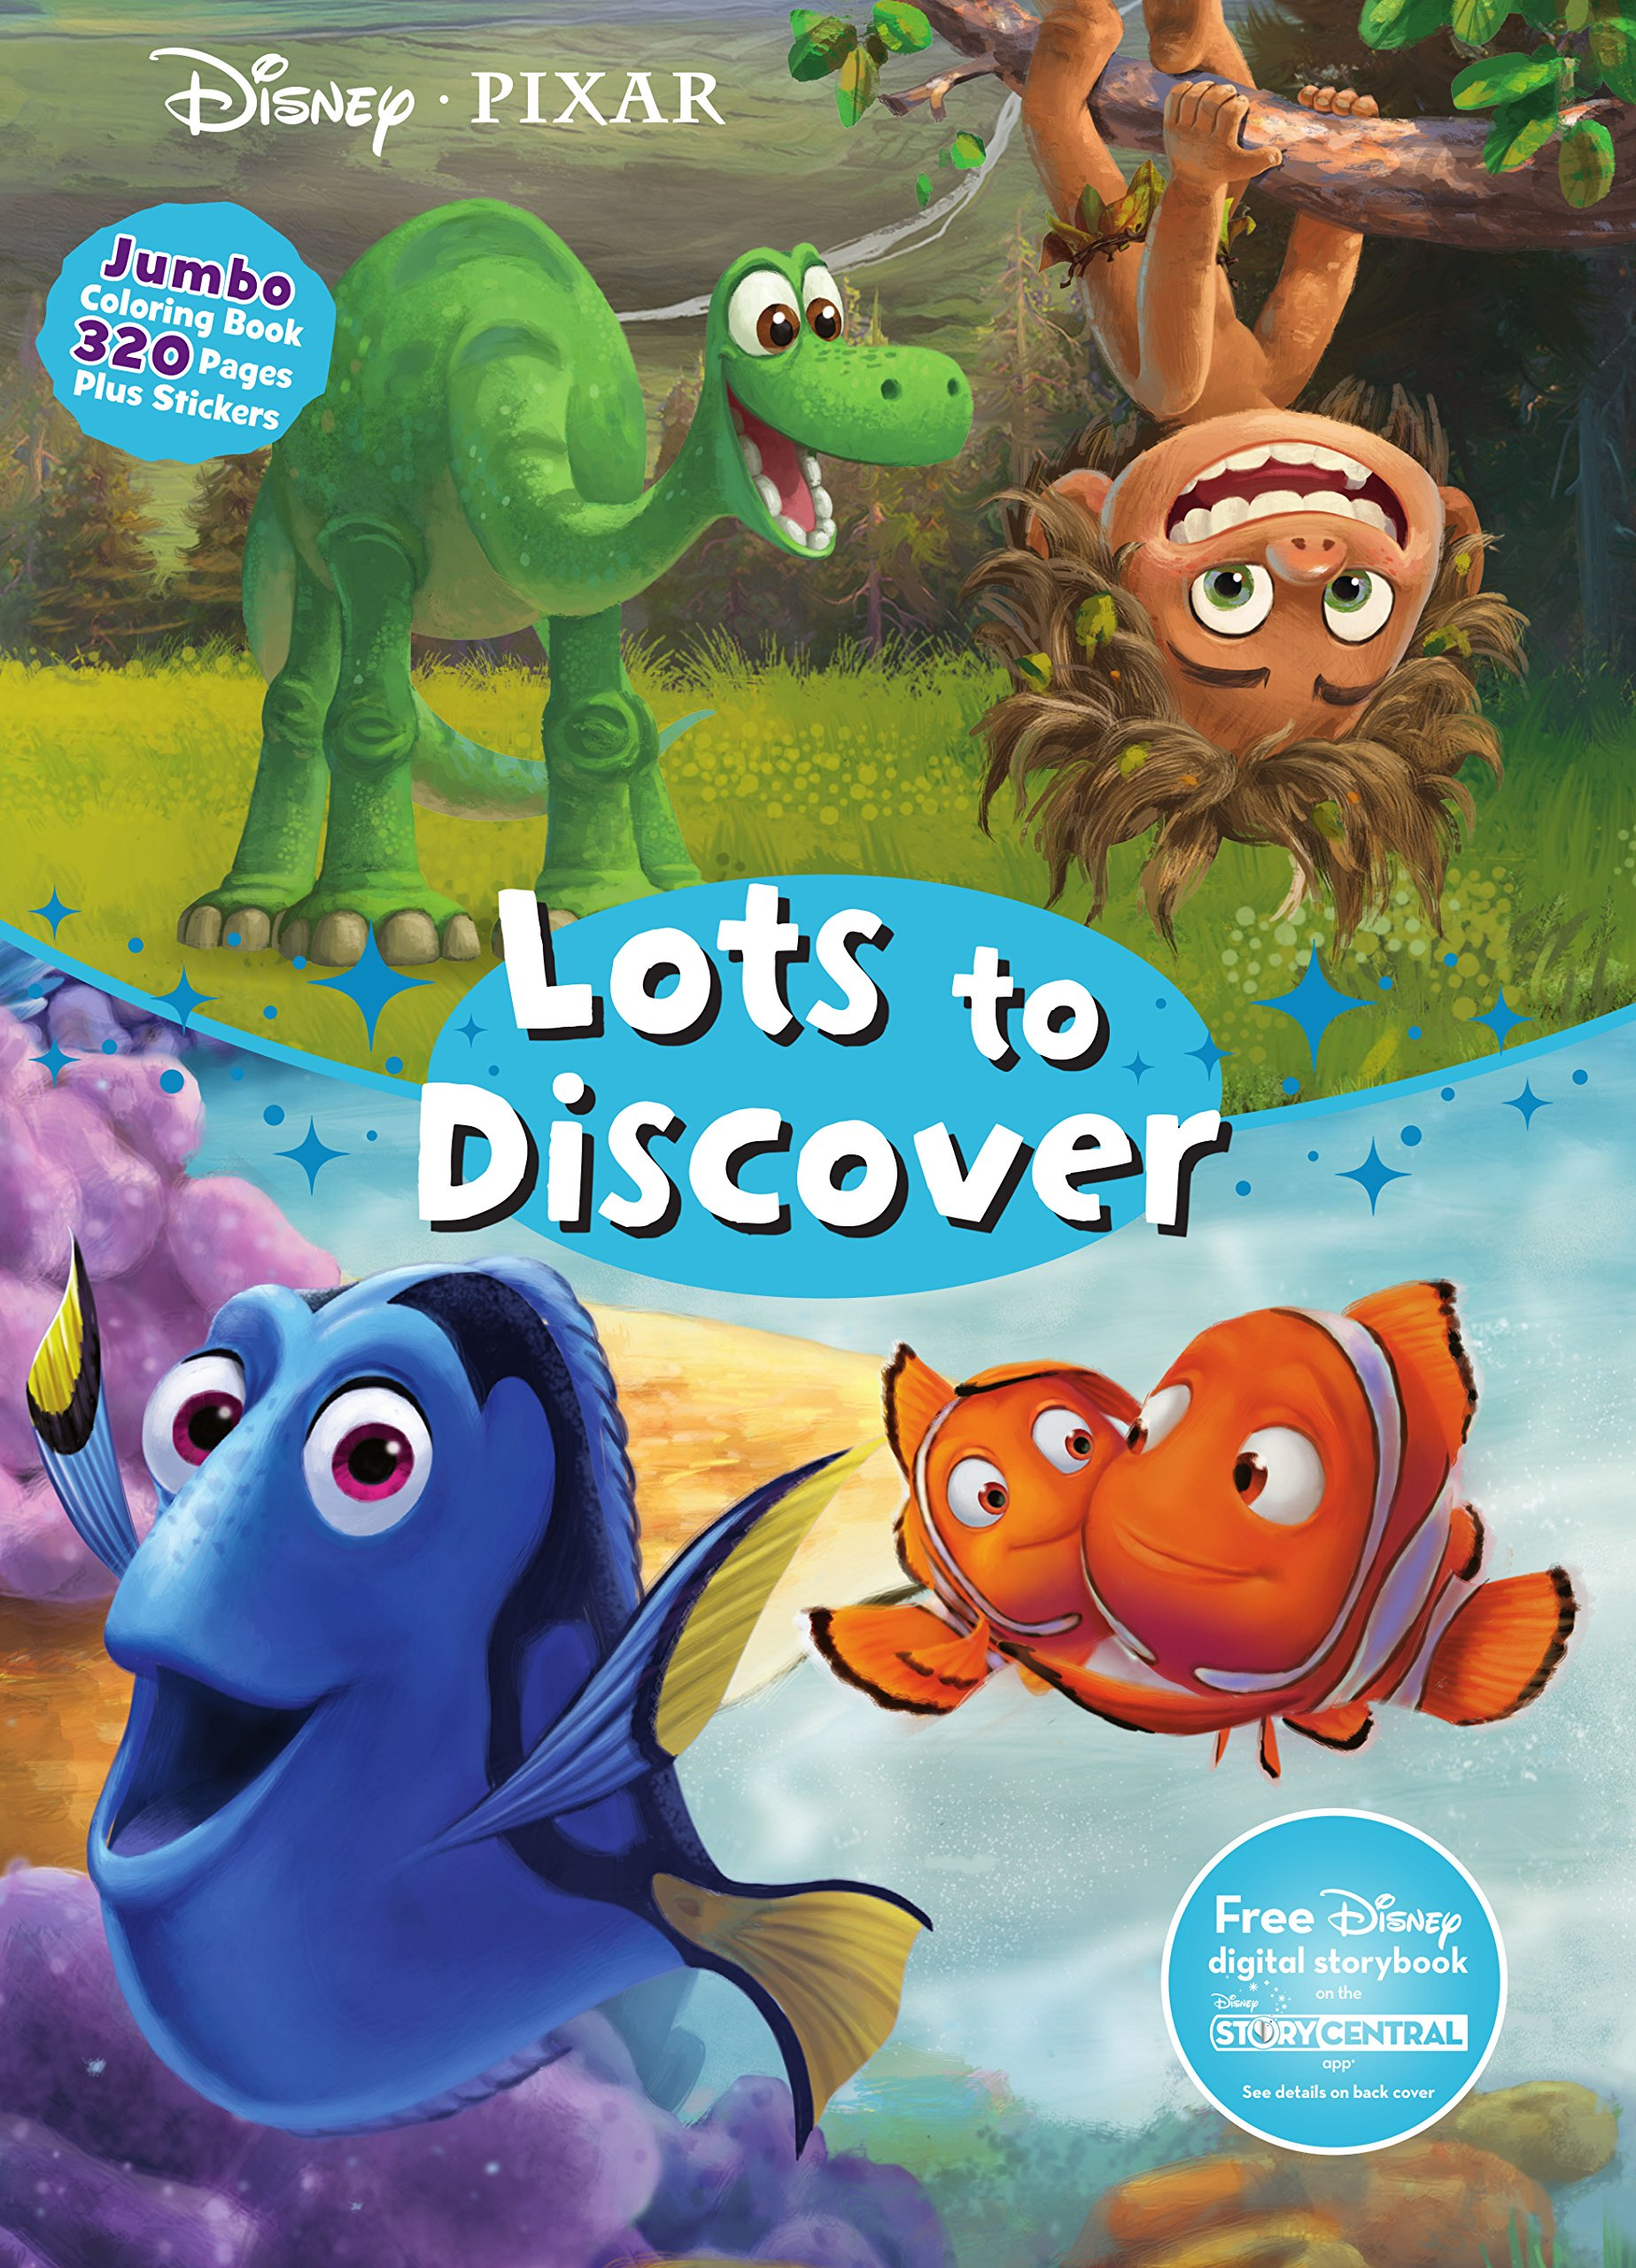 disney pixar lots to discover jumbo coloring book parragon books ltd 9781474837620 amazoncom books - Jumbo Coloring Book